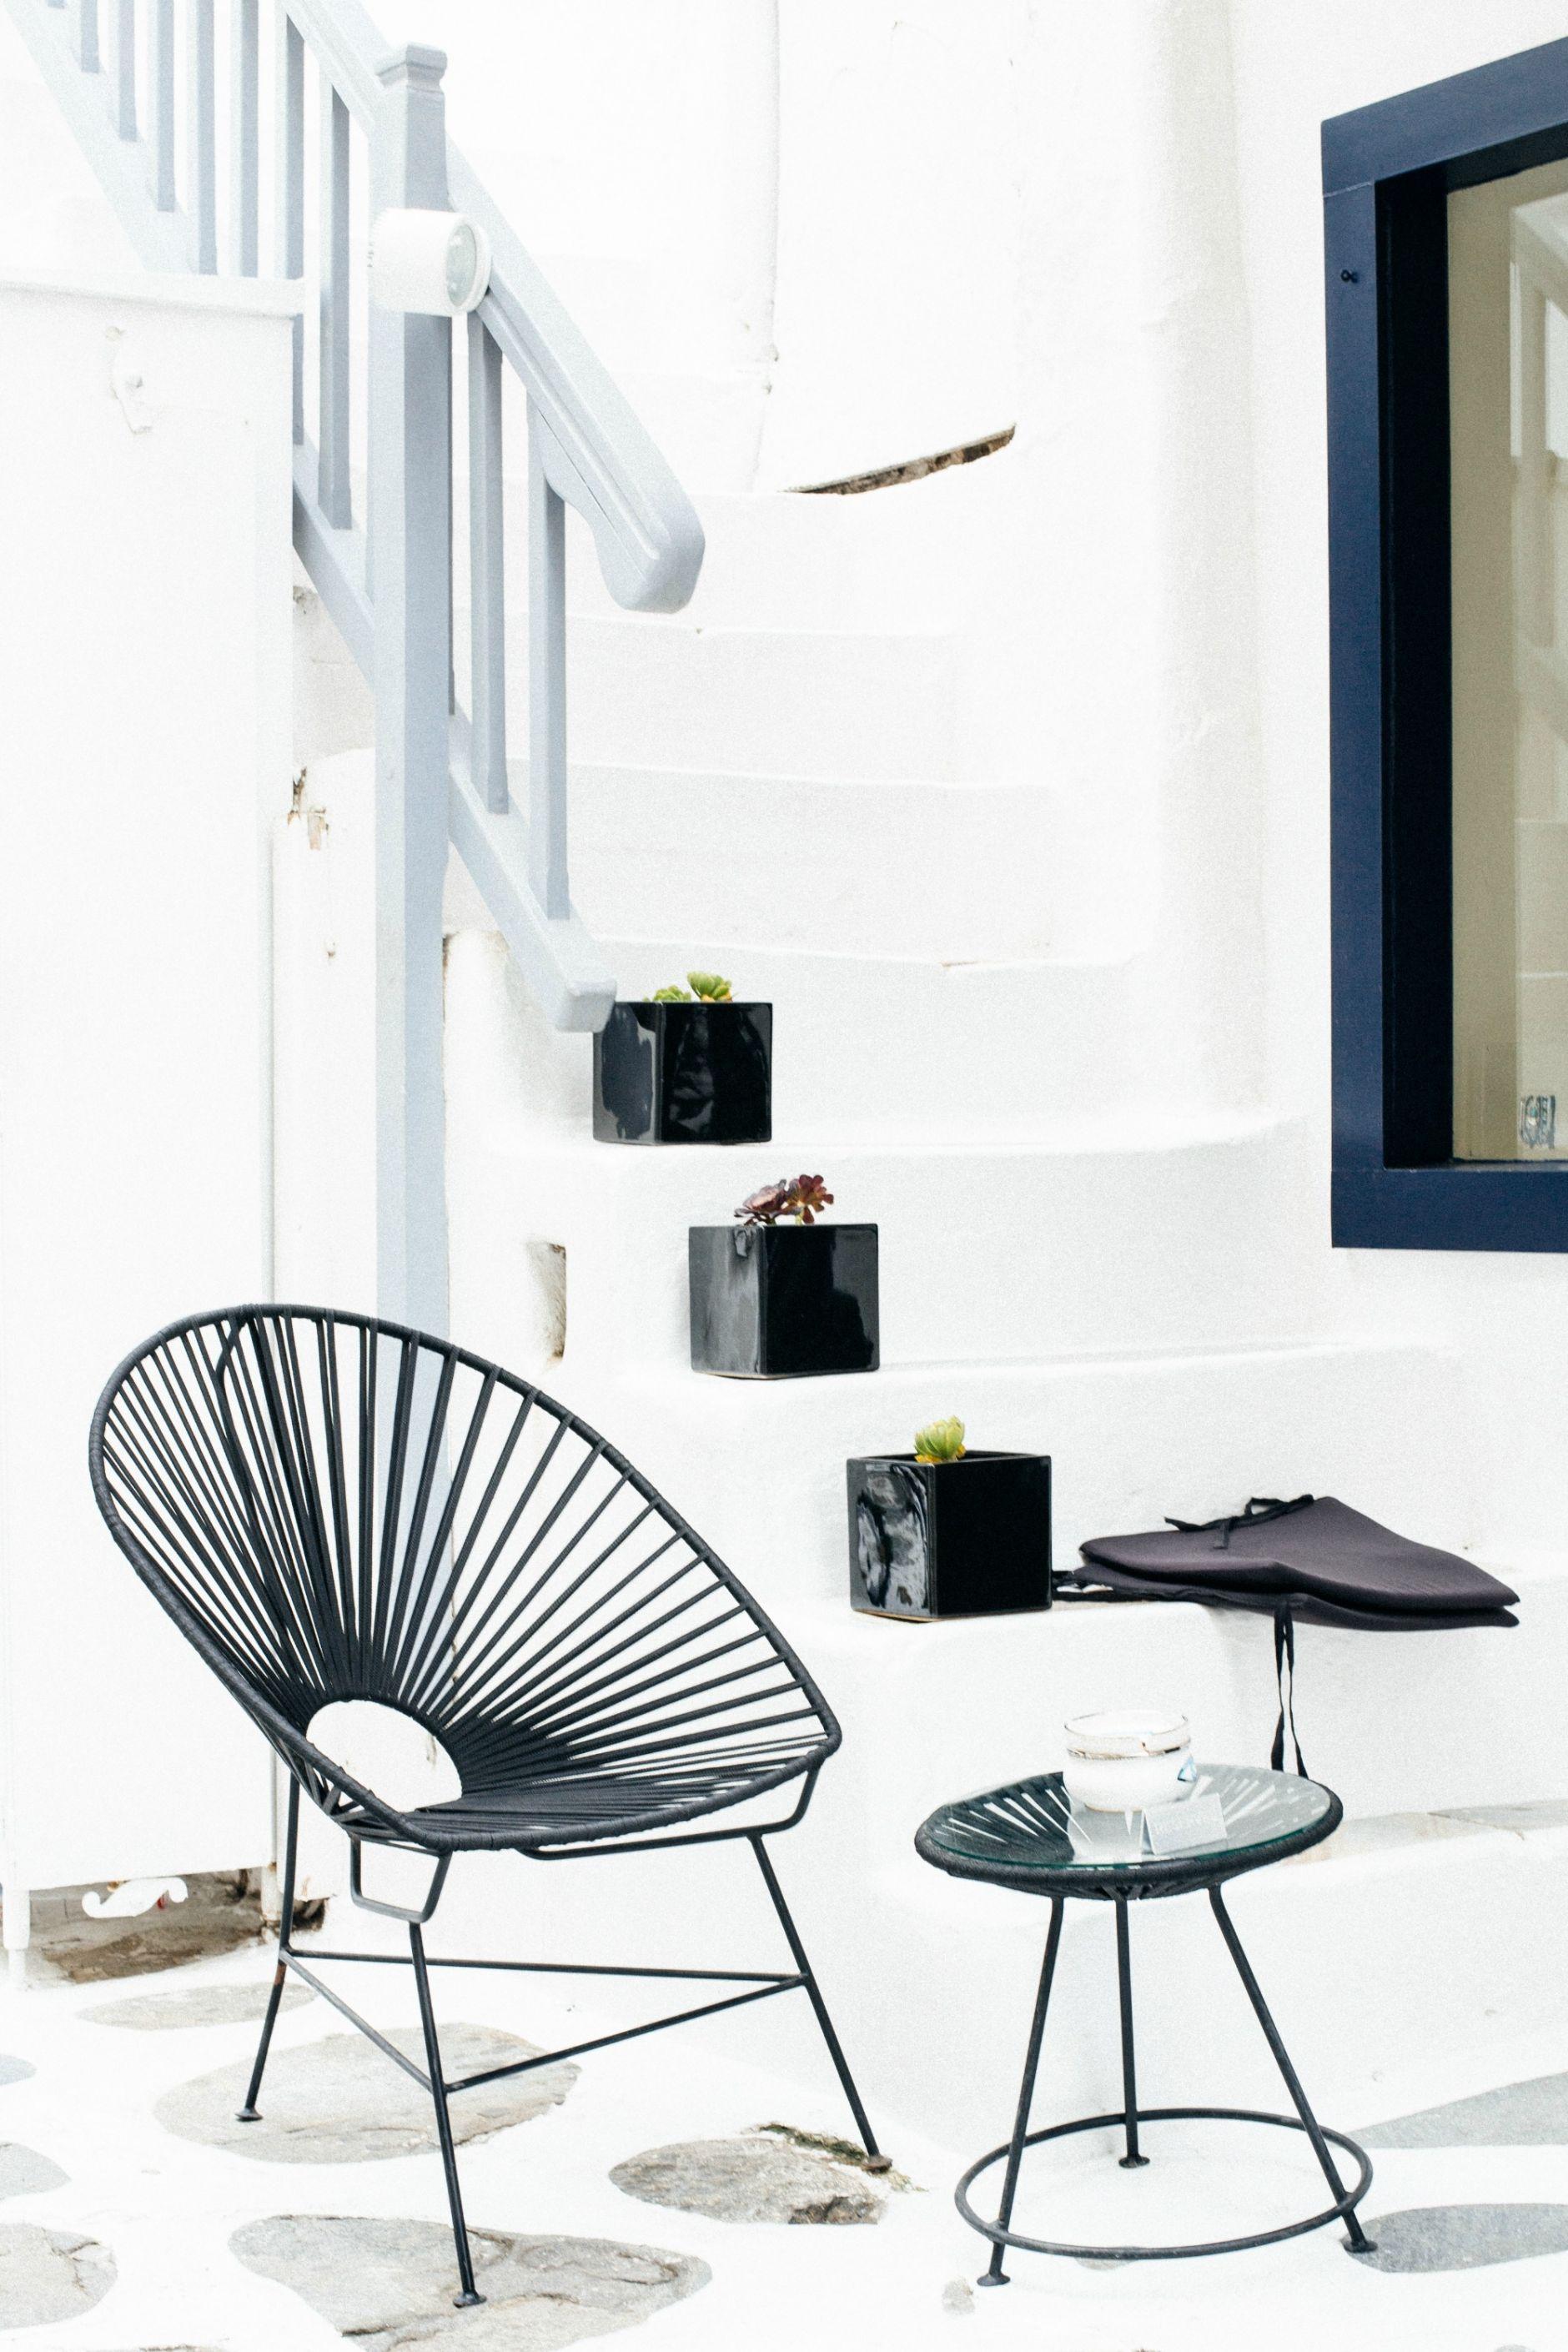 wind-mills-mykonos-town-2016-holidays-vacay-disi-couture-lemon-print-dress-16